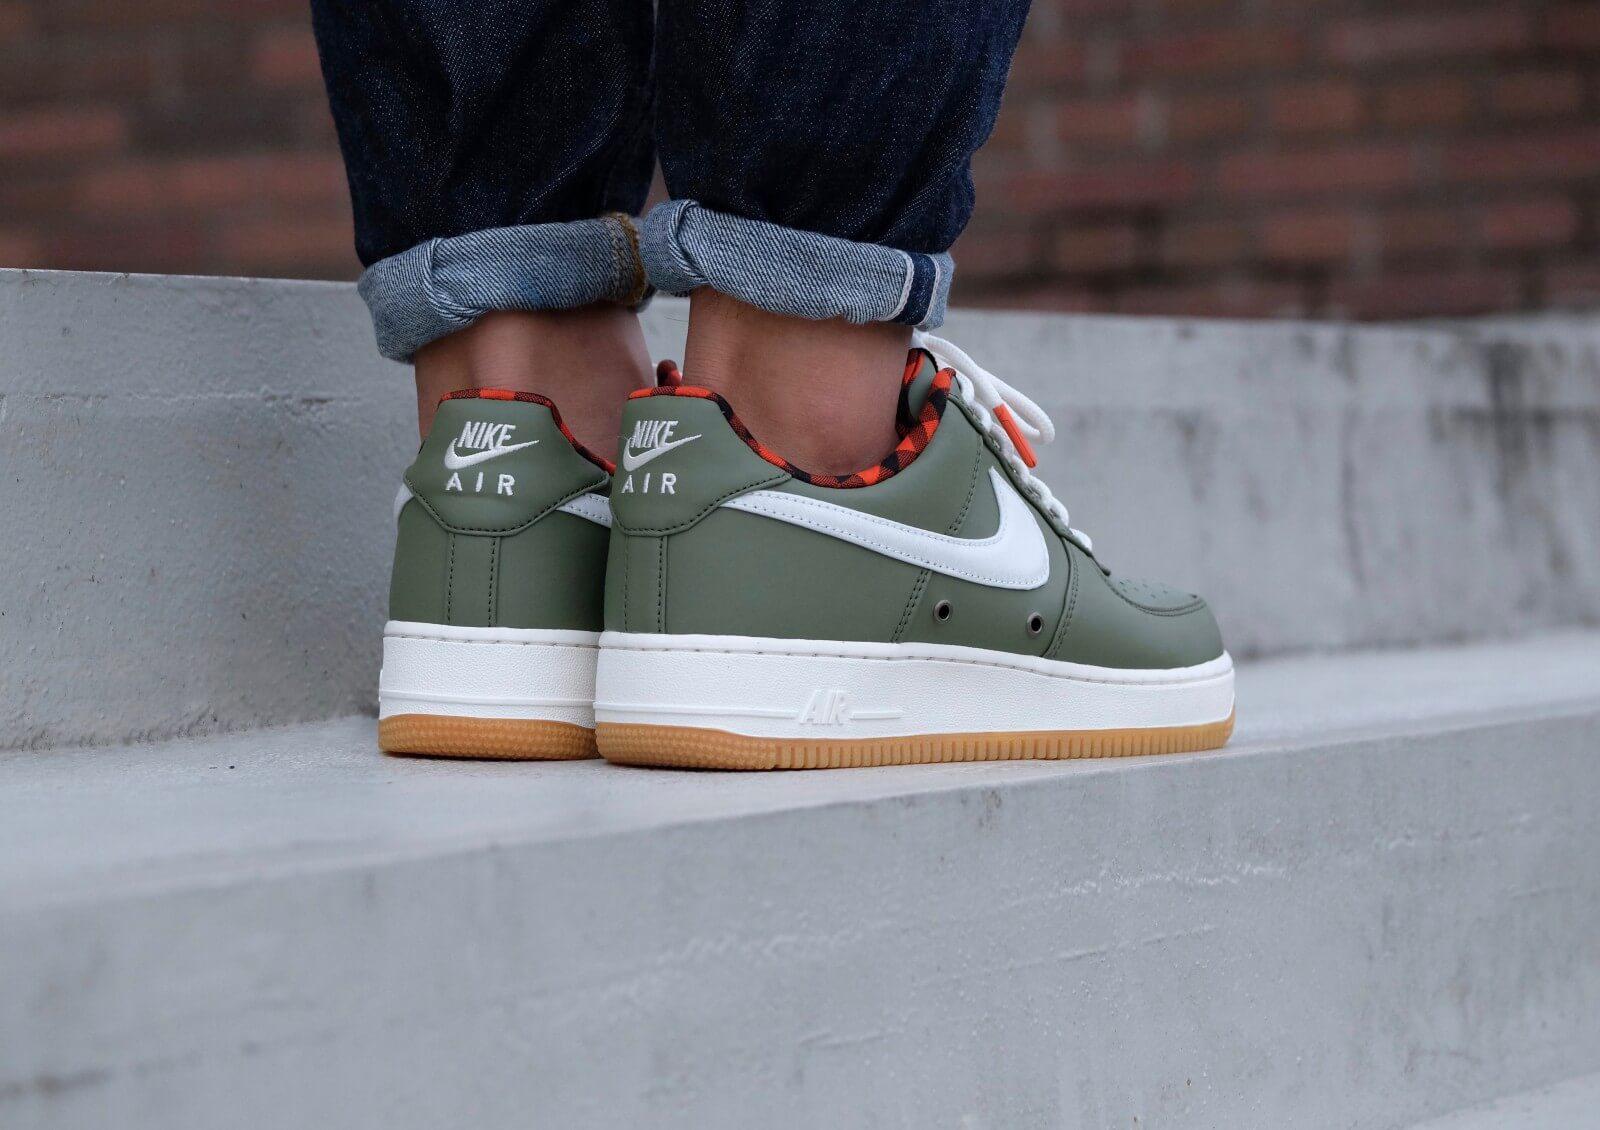 nike air force 1 lv8 groen